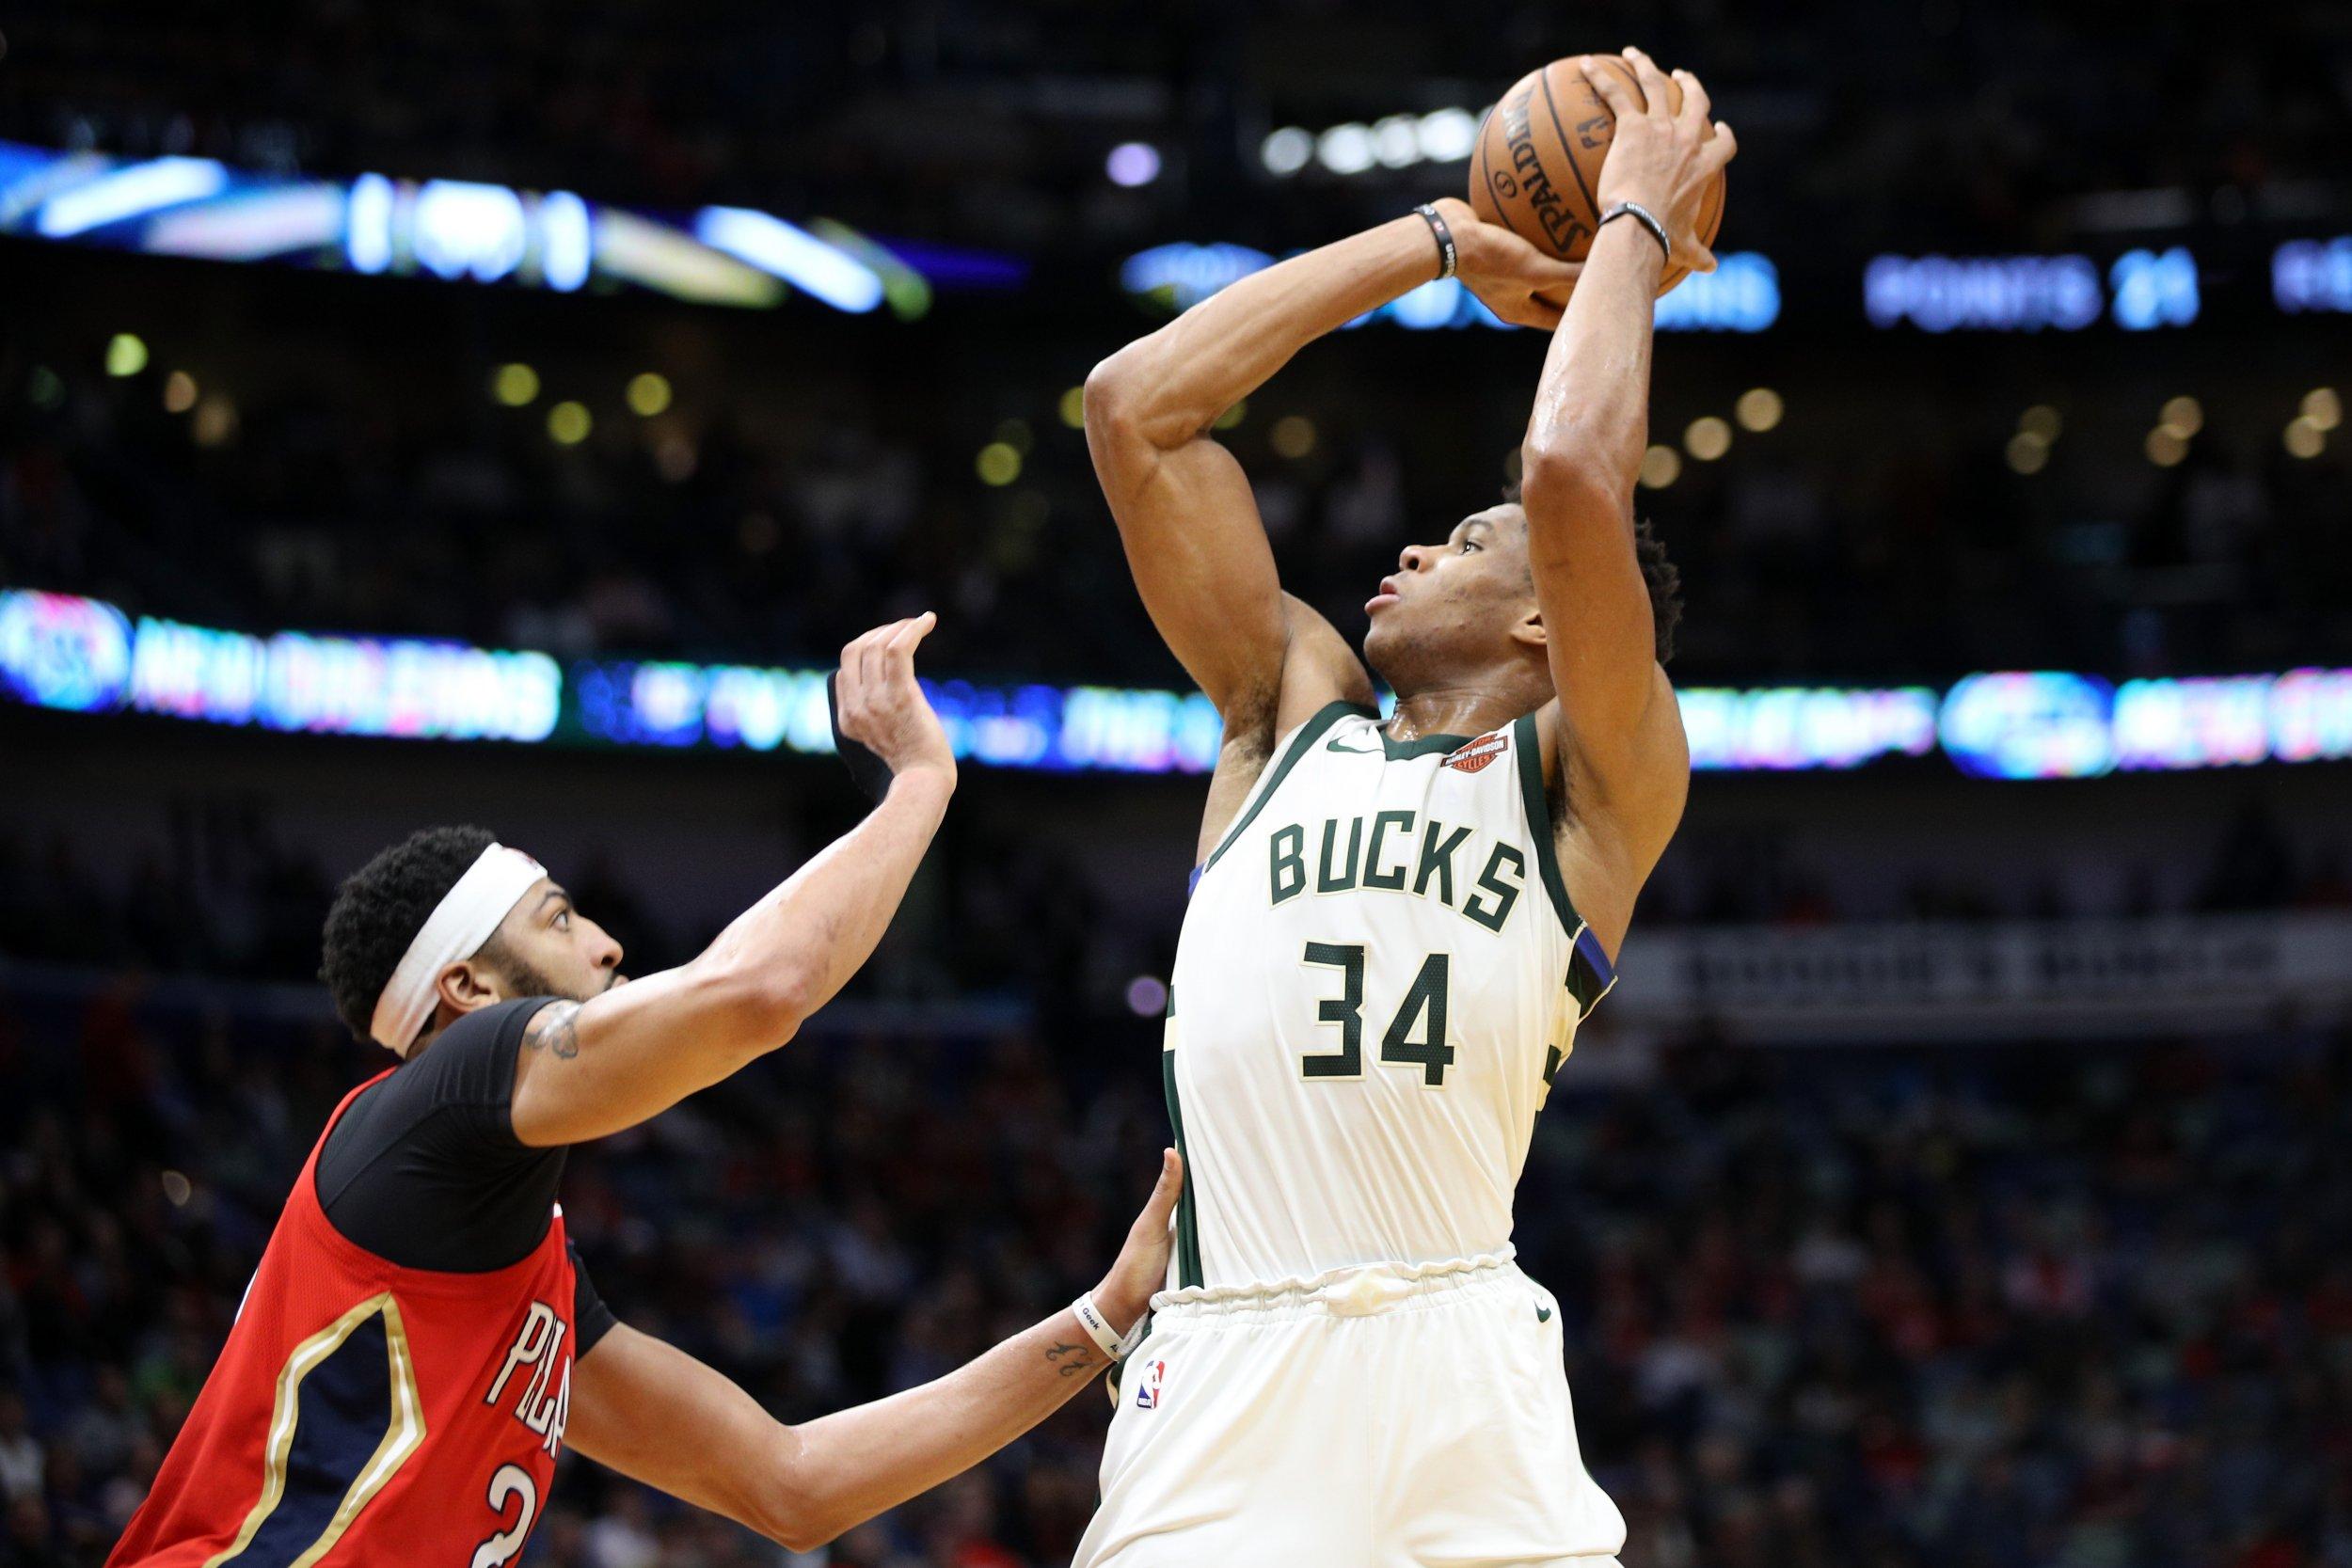 Giannis Antetokounmpo of the Milwaukee Bucks shoots the ball over Anthony Davis at Smoothie King Center, New Orleans, Louisiana, December 13 2017.